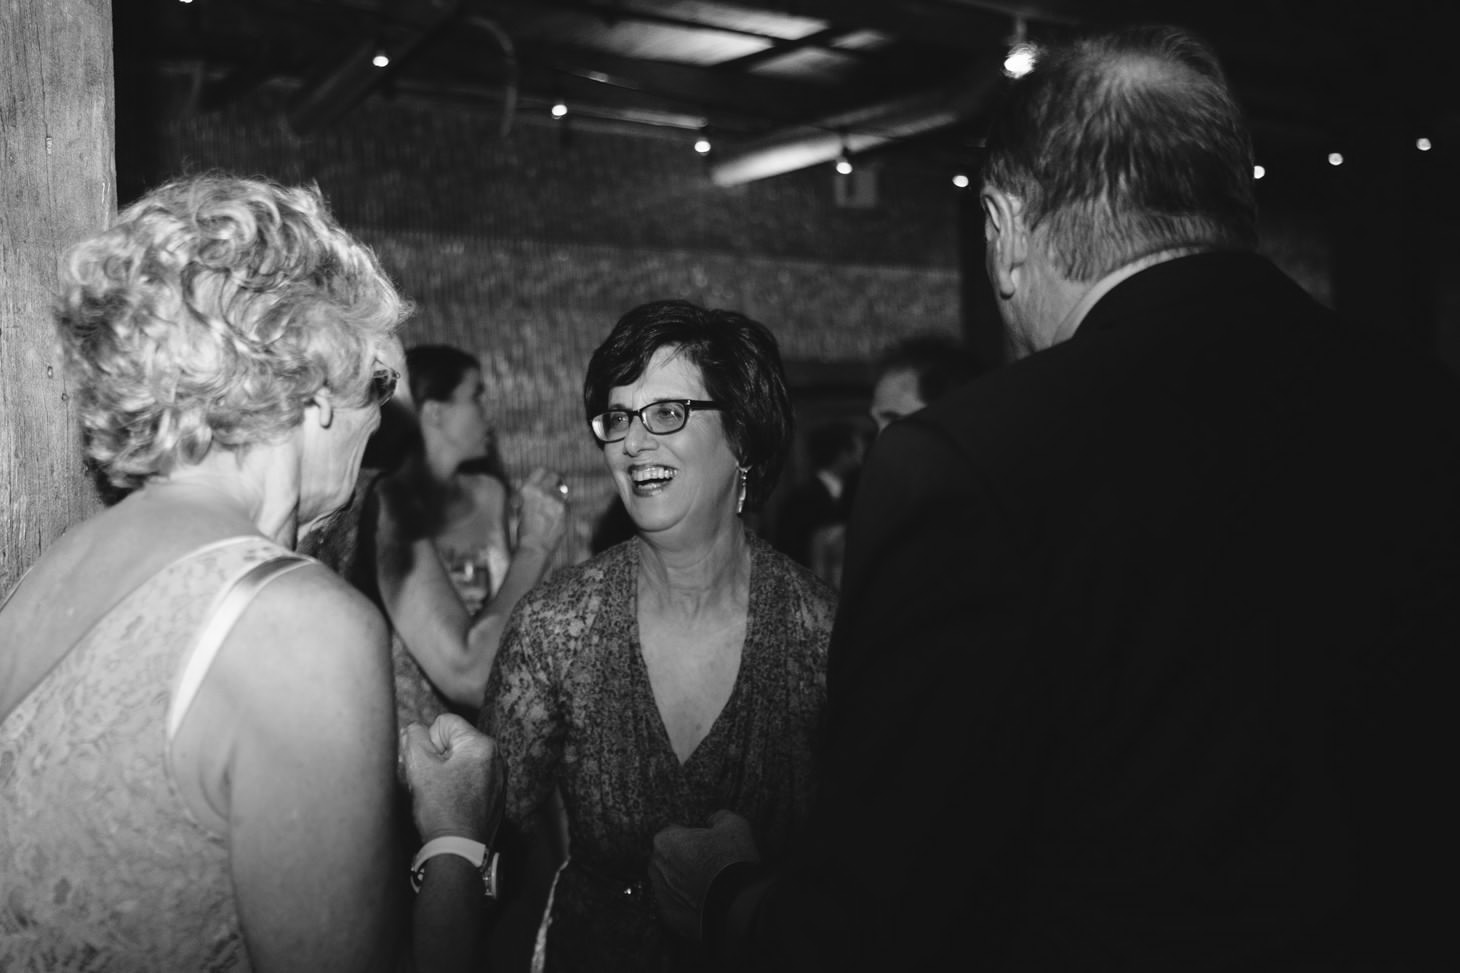 049-nyc-dumbo-loft-brooklyn-wedding-photographer-smitten-chickens-photo-.jpg